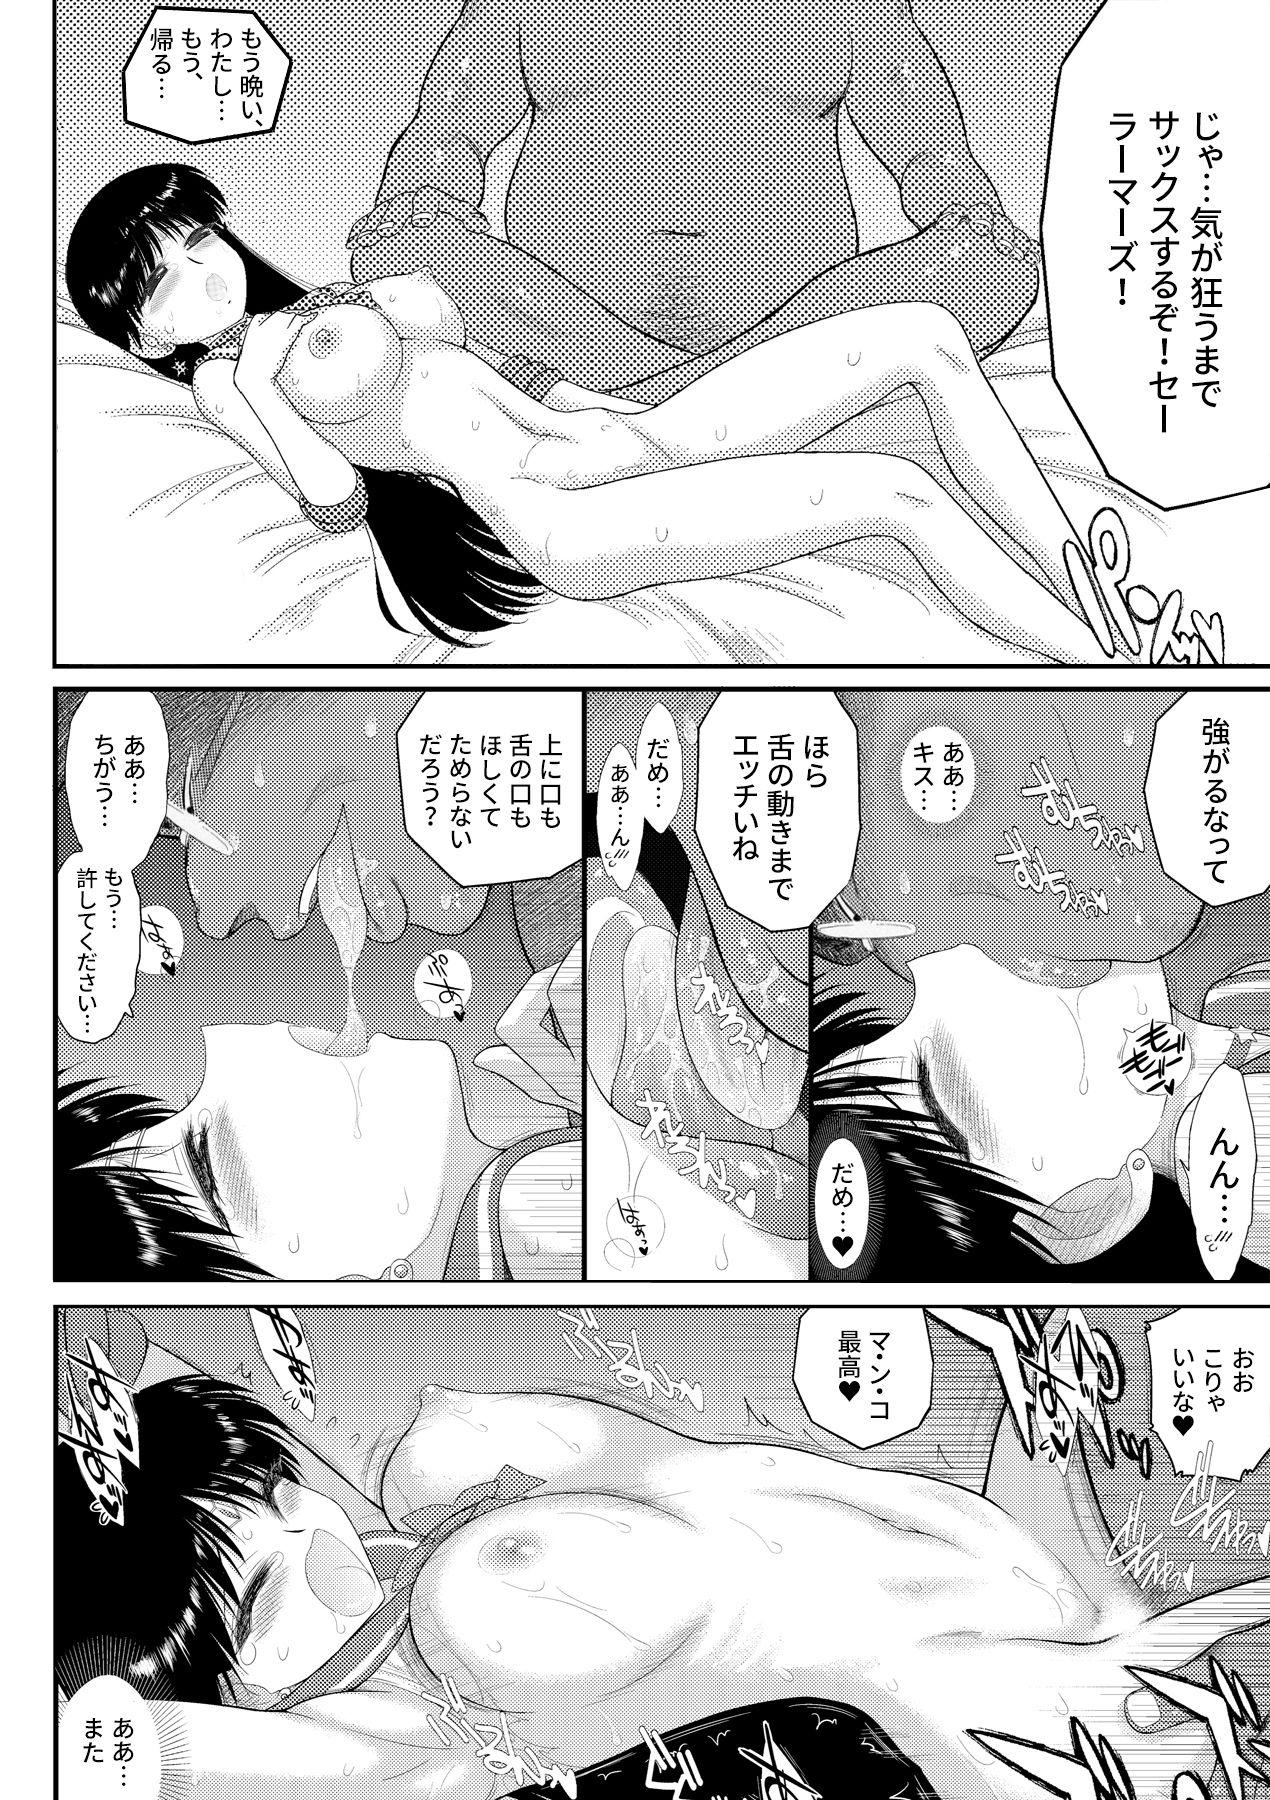 The Fertilization of Rei Hino 27